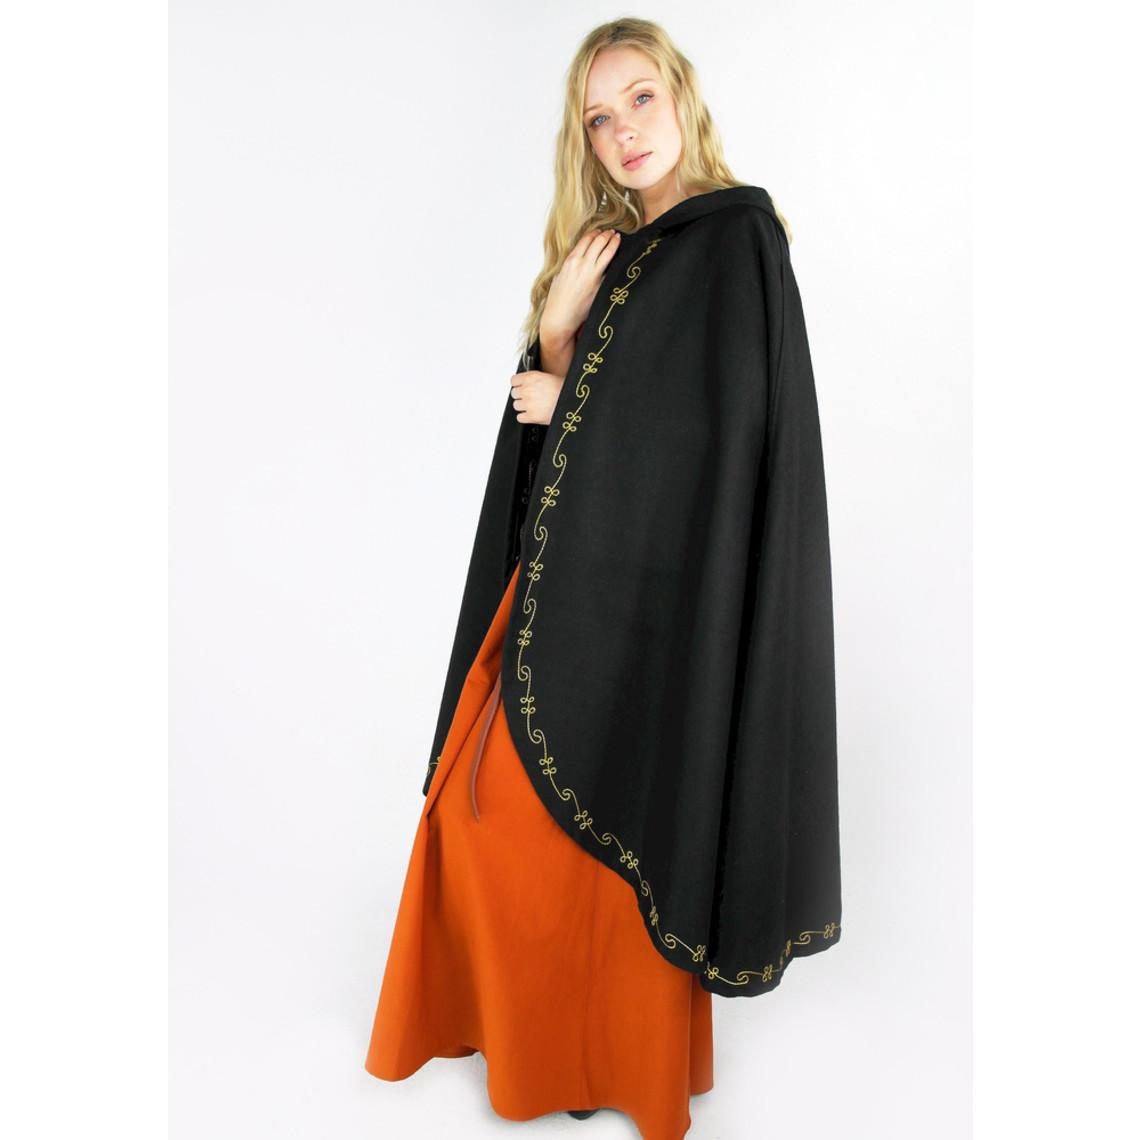 Leonardo Carbone Wool cloak Ceridwen, black